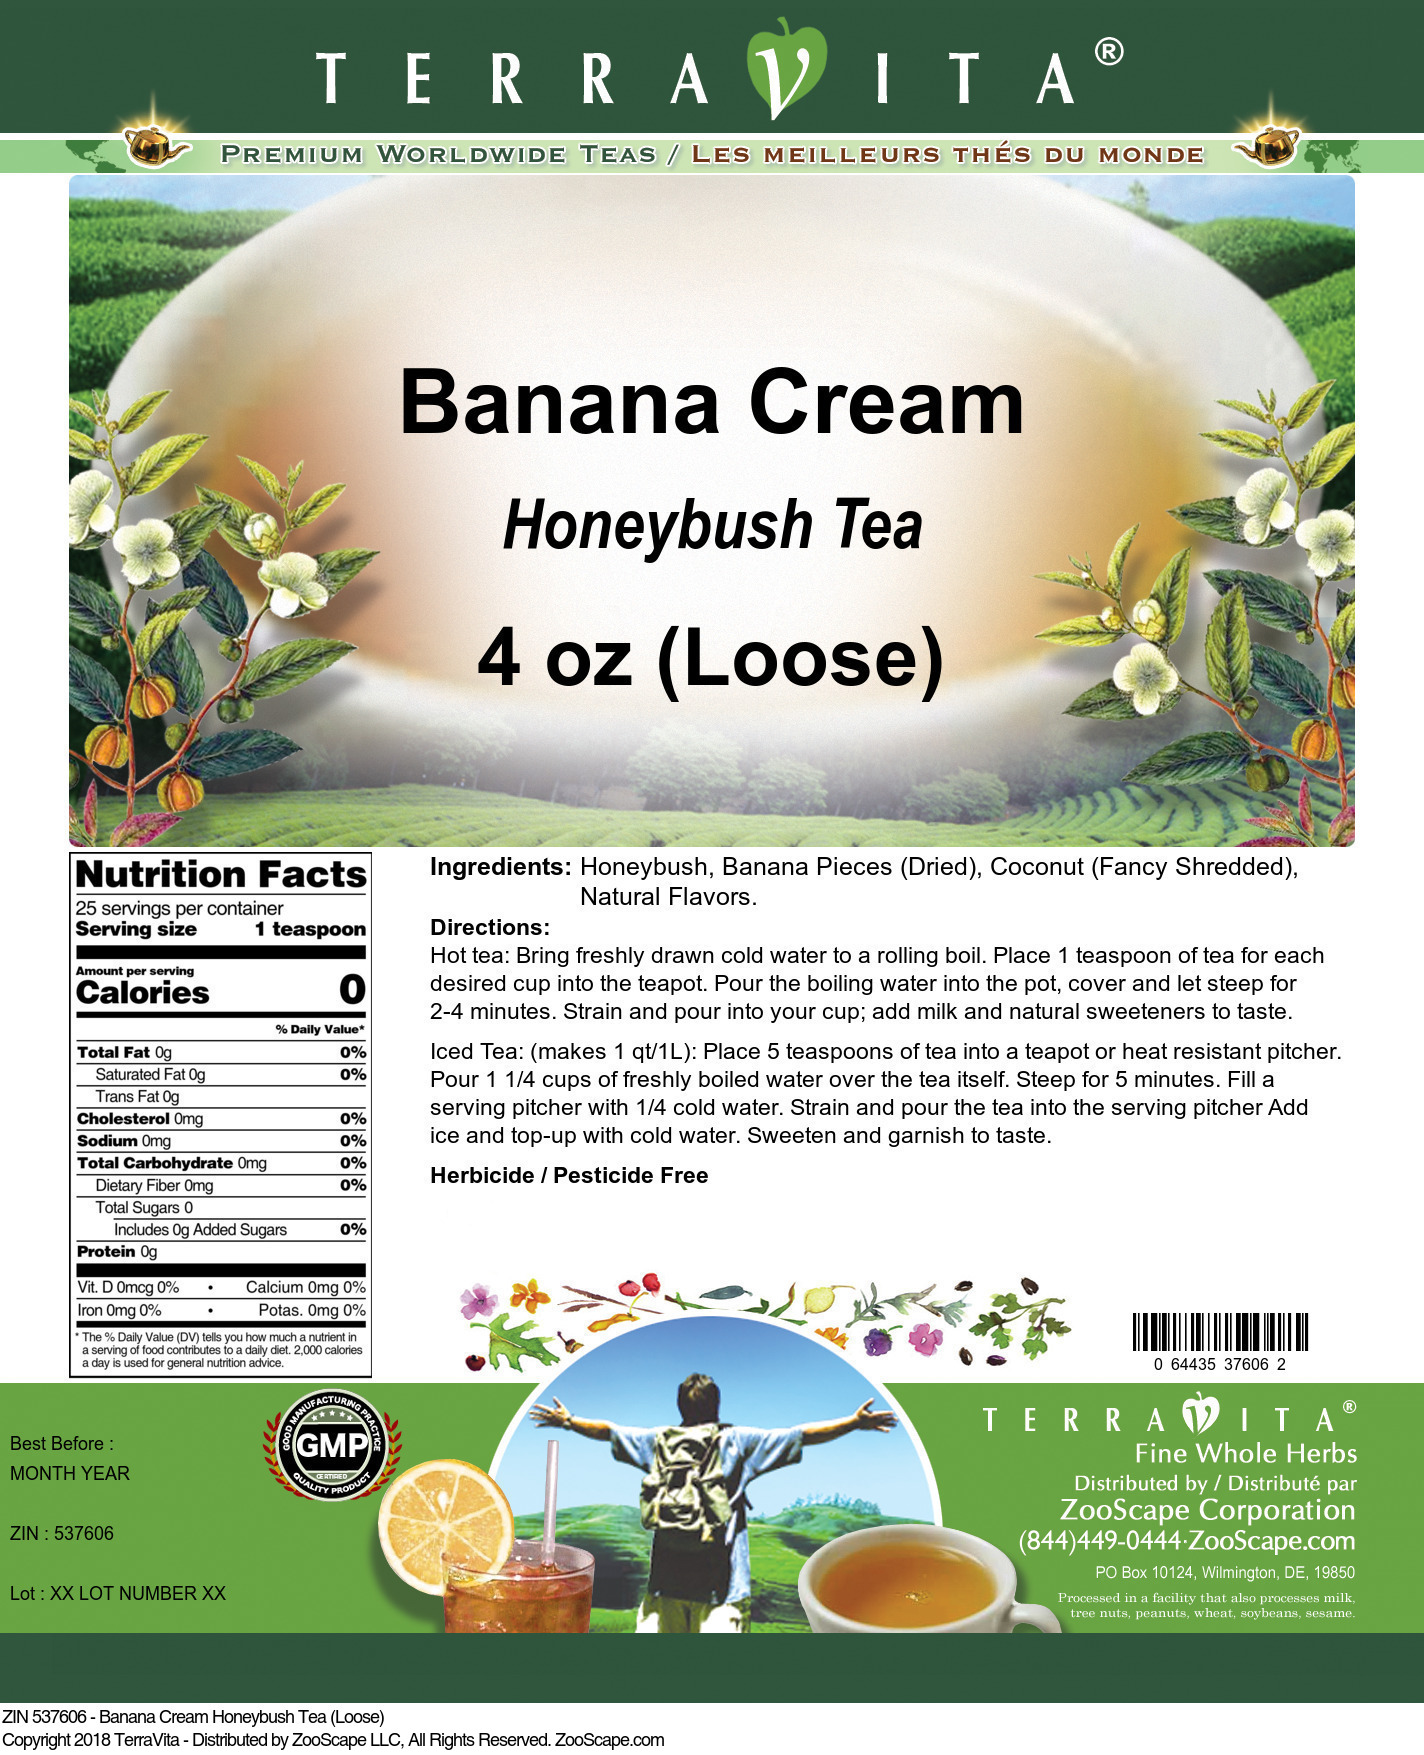 Banana Cream Honeybush Tea (Loose)